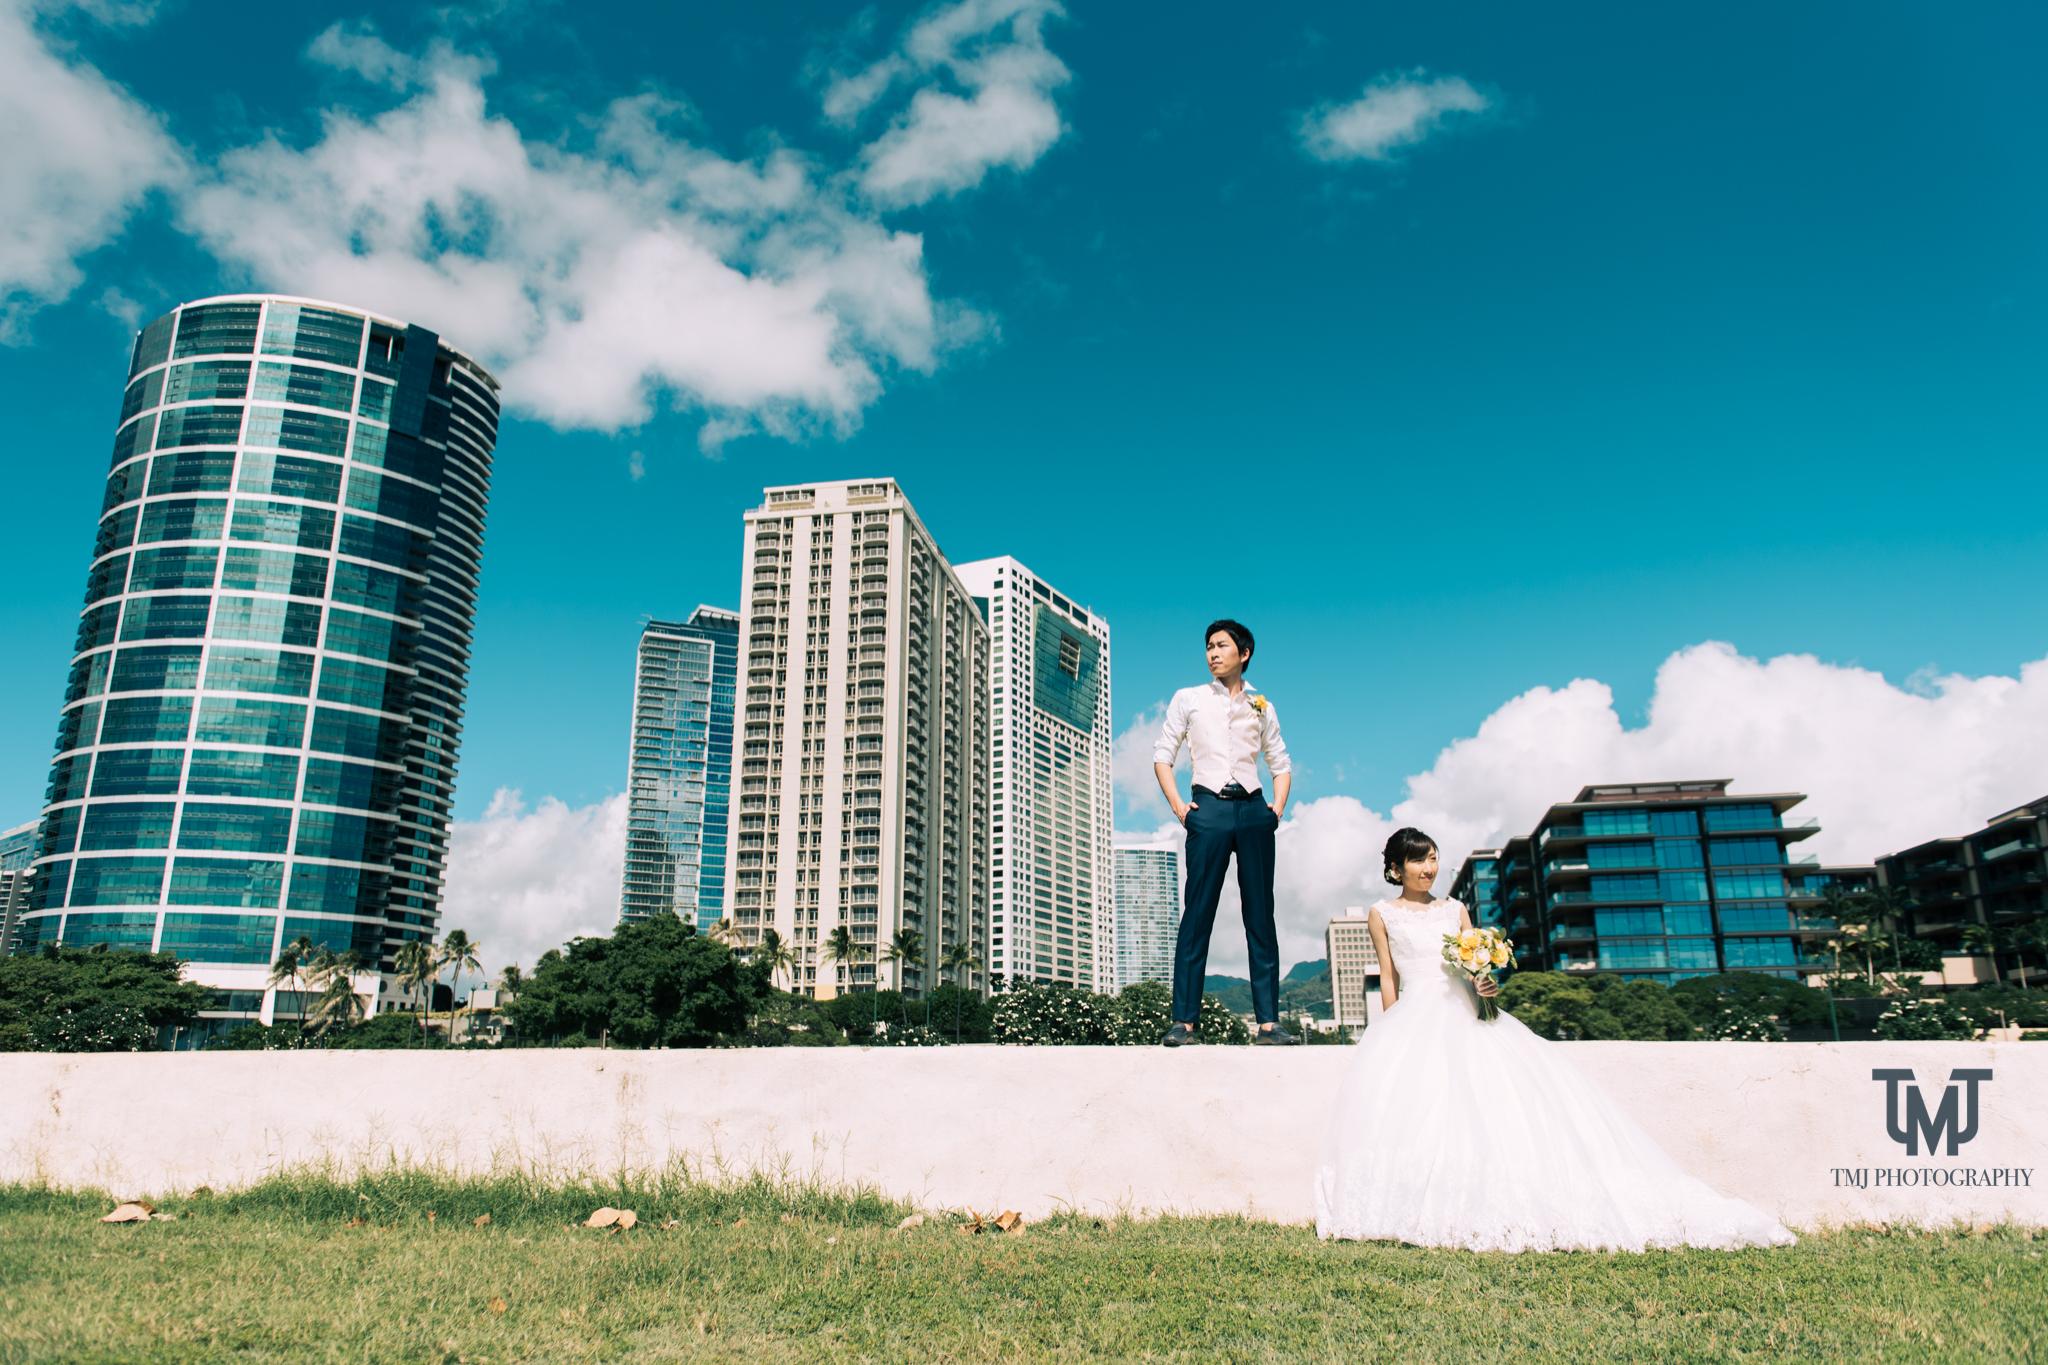 Trump_Hotel_Plumeria_Garden_Hawaii_Wedding_Photography-037.jpg